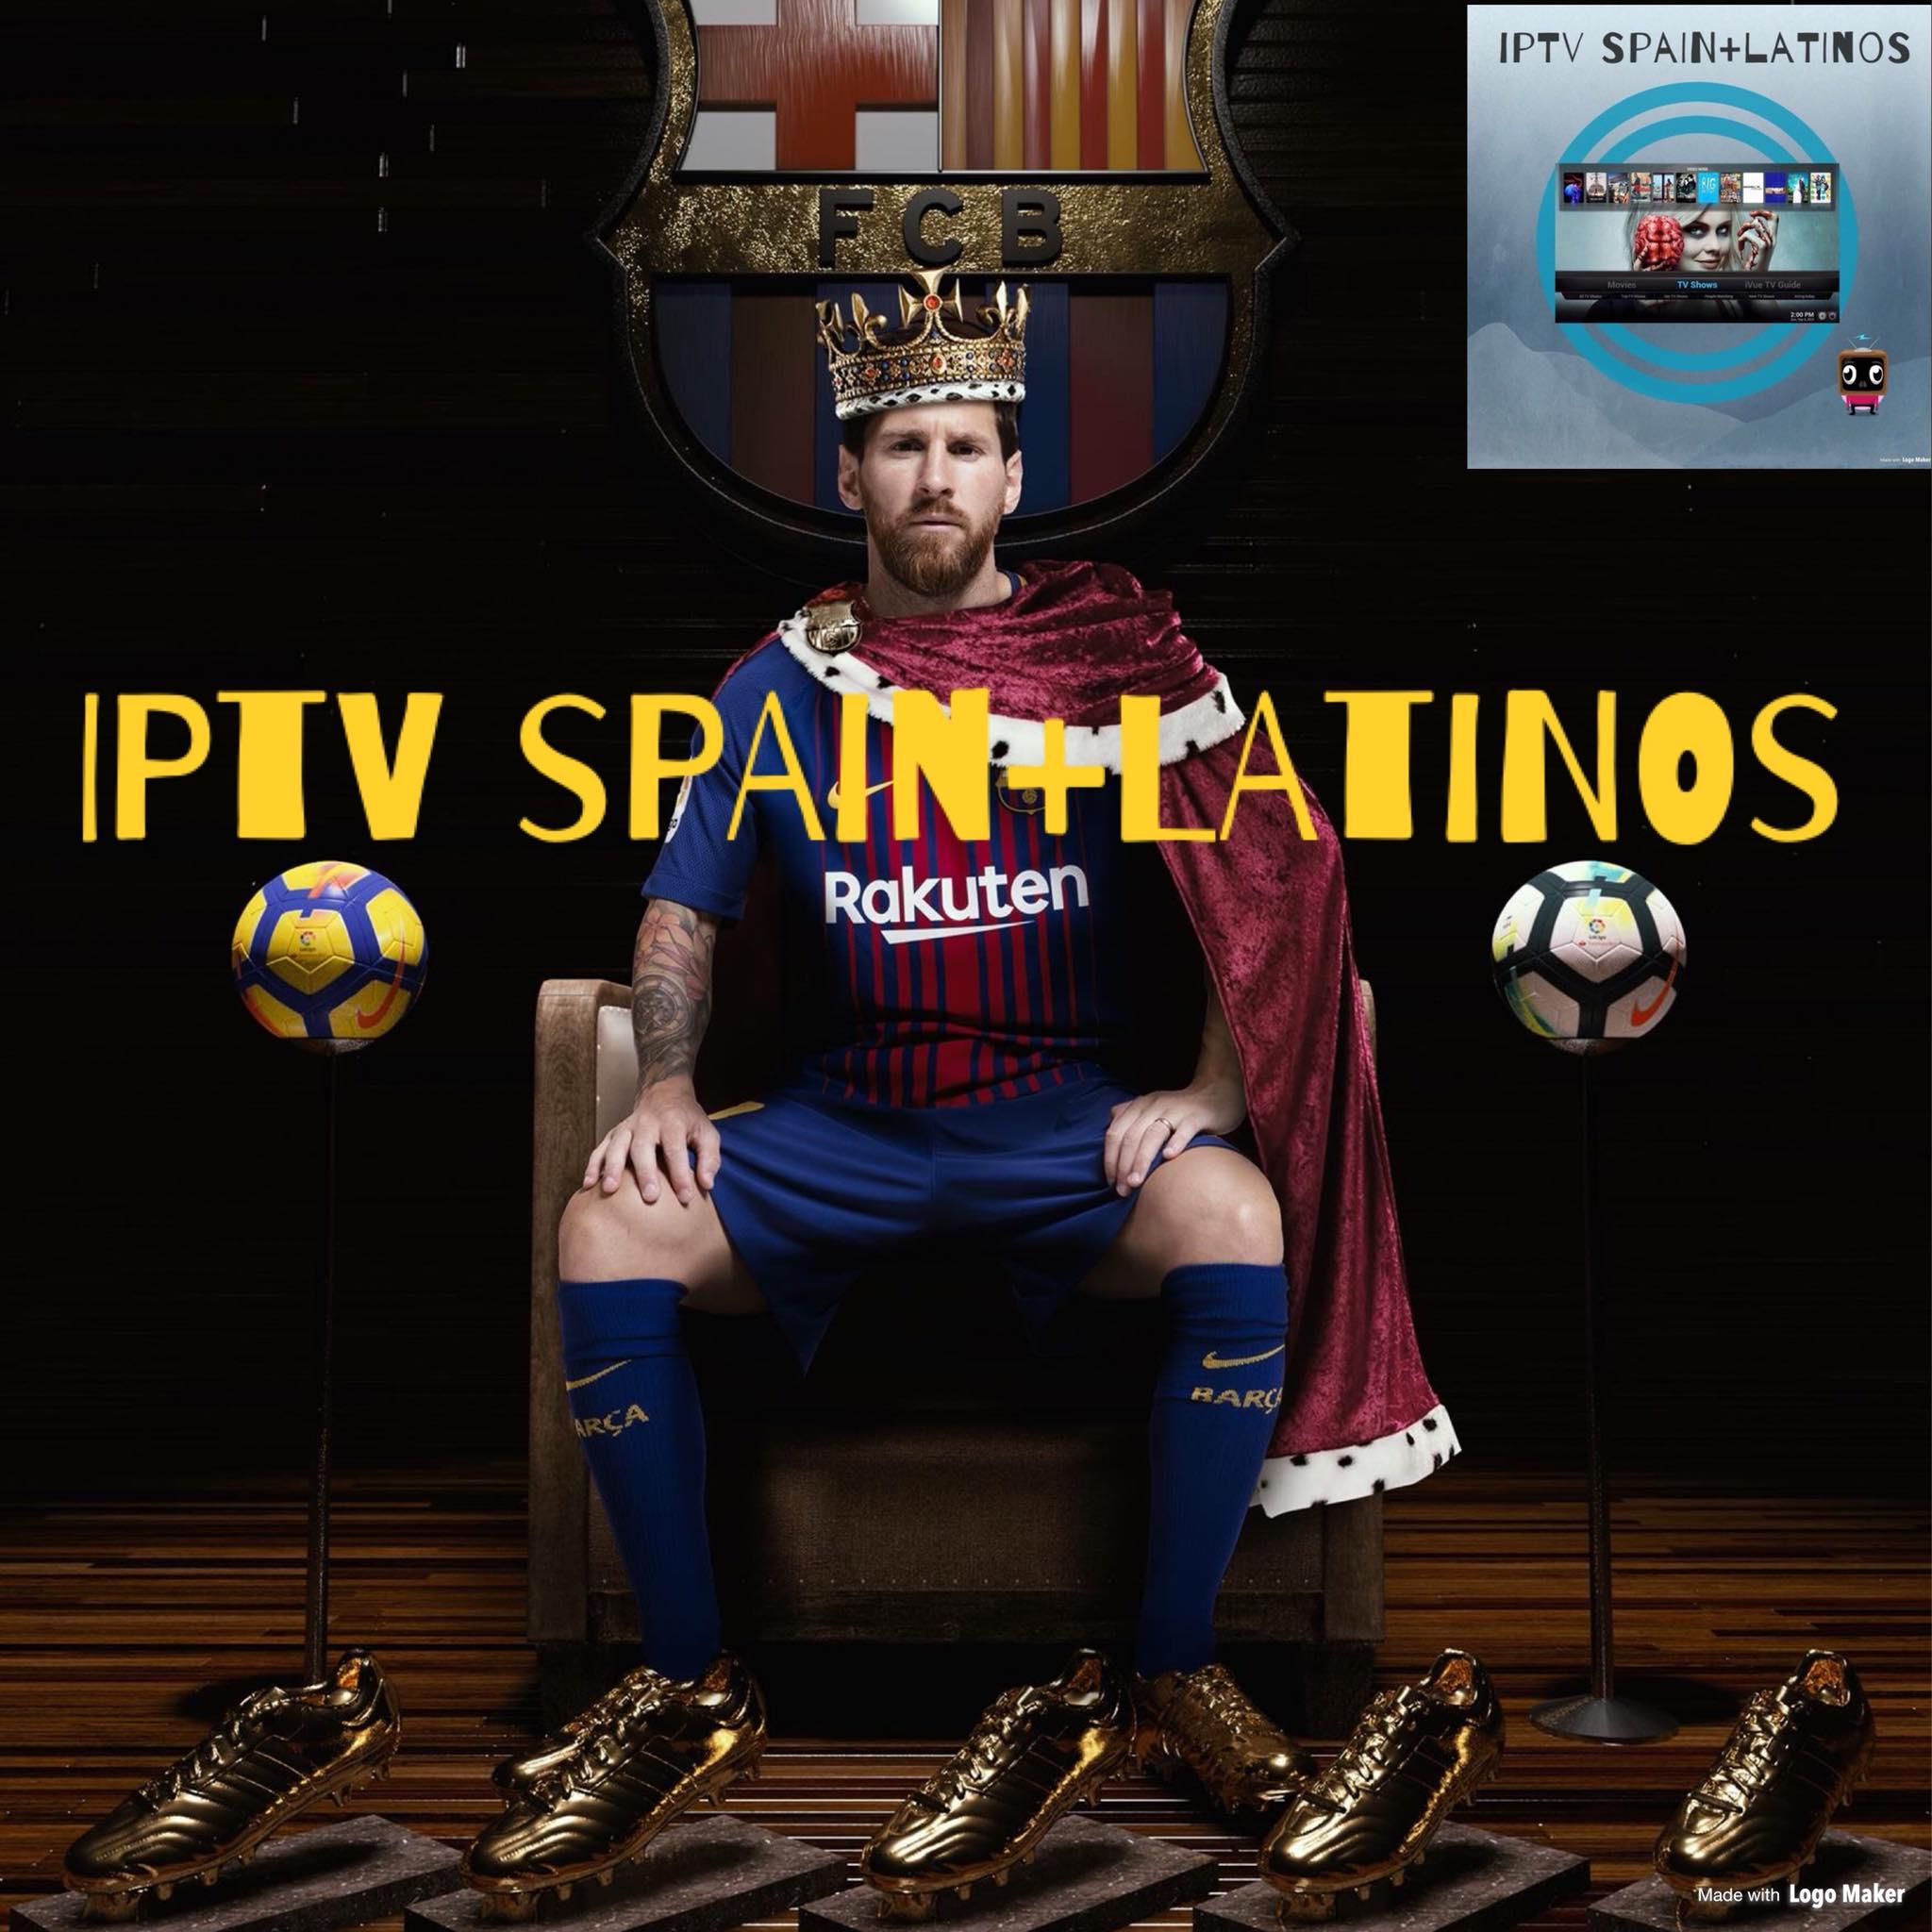 SPAIN+LATINOS FULL HD RESELLER 120 CREDITS | VIP-IPTVSPAINLATINOS